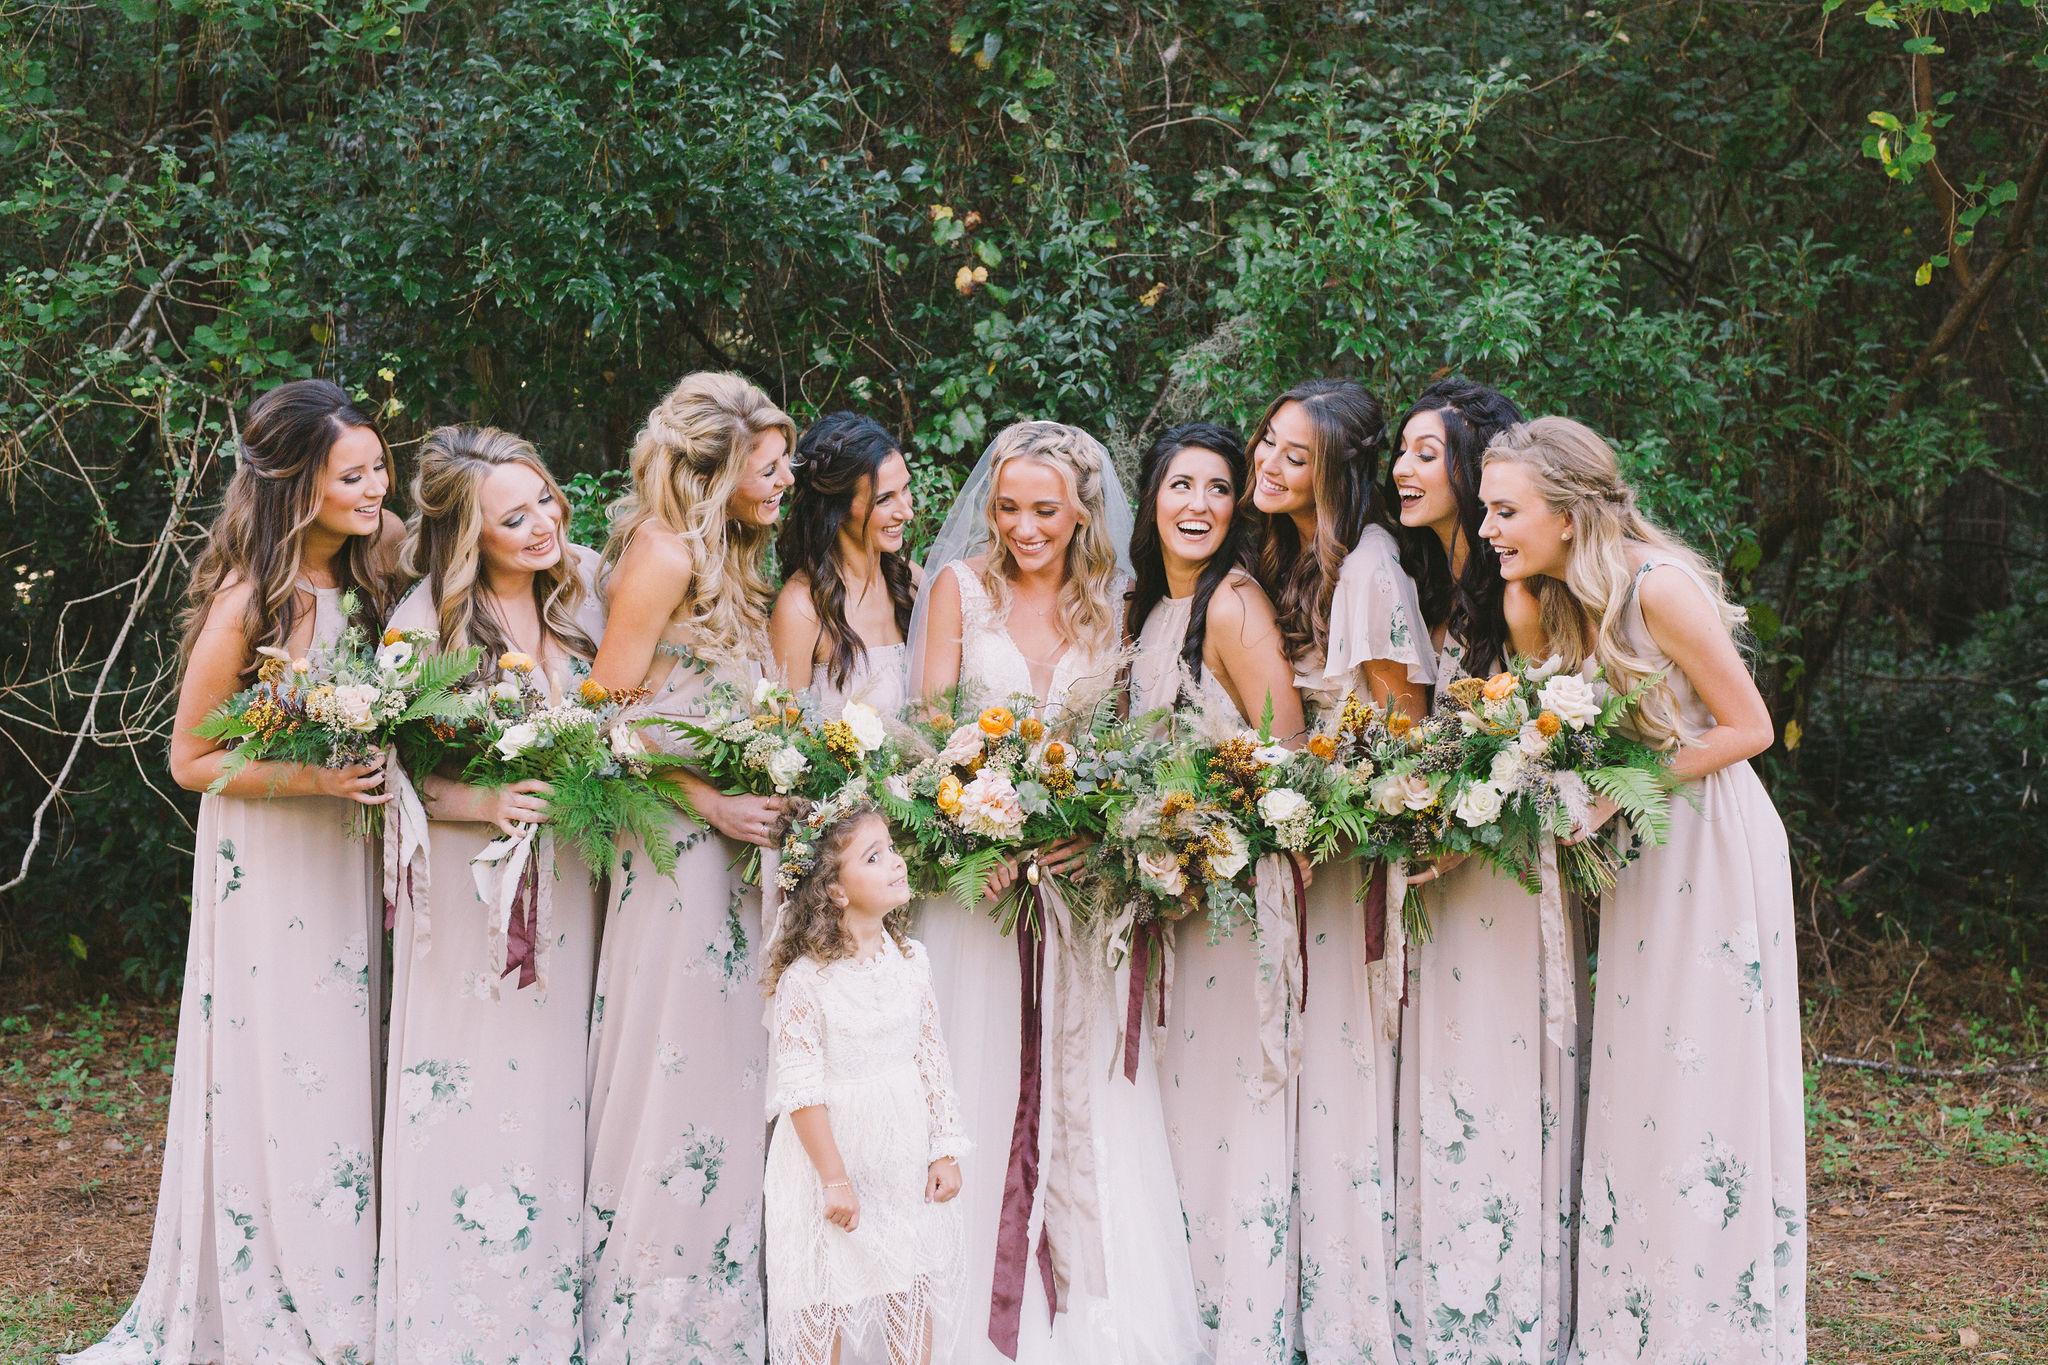 Jesseandlex_181103_AlexisNate_Wedding_BridalParty_017.jpg